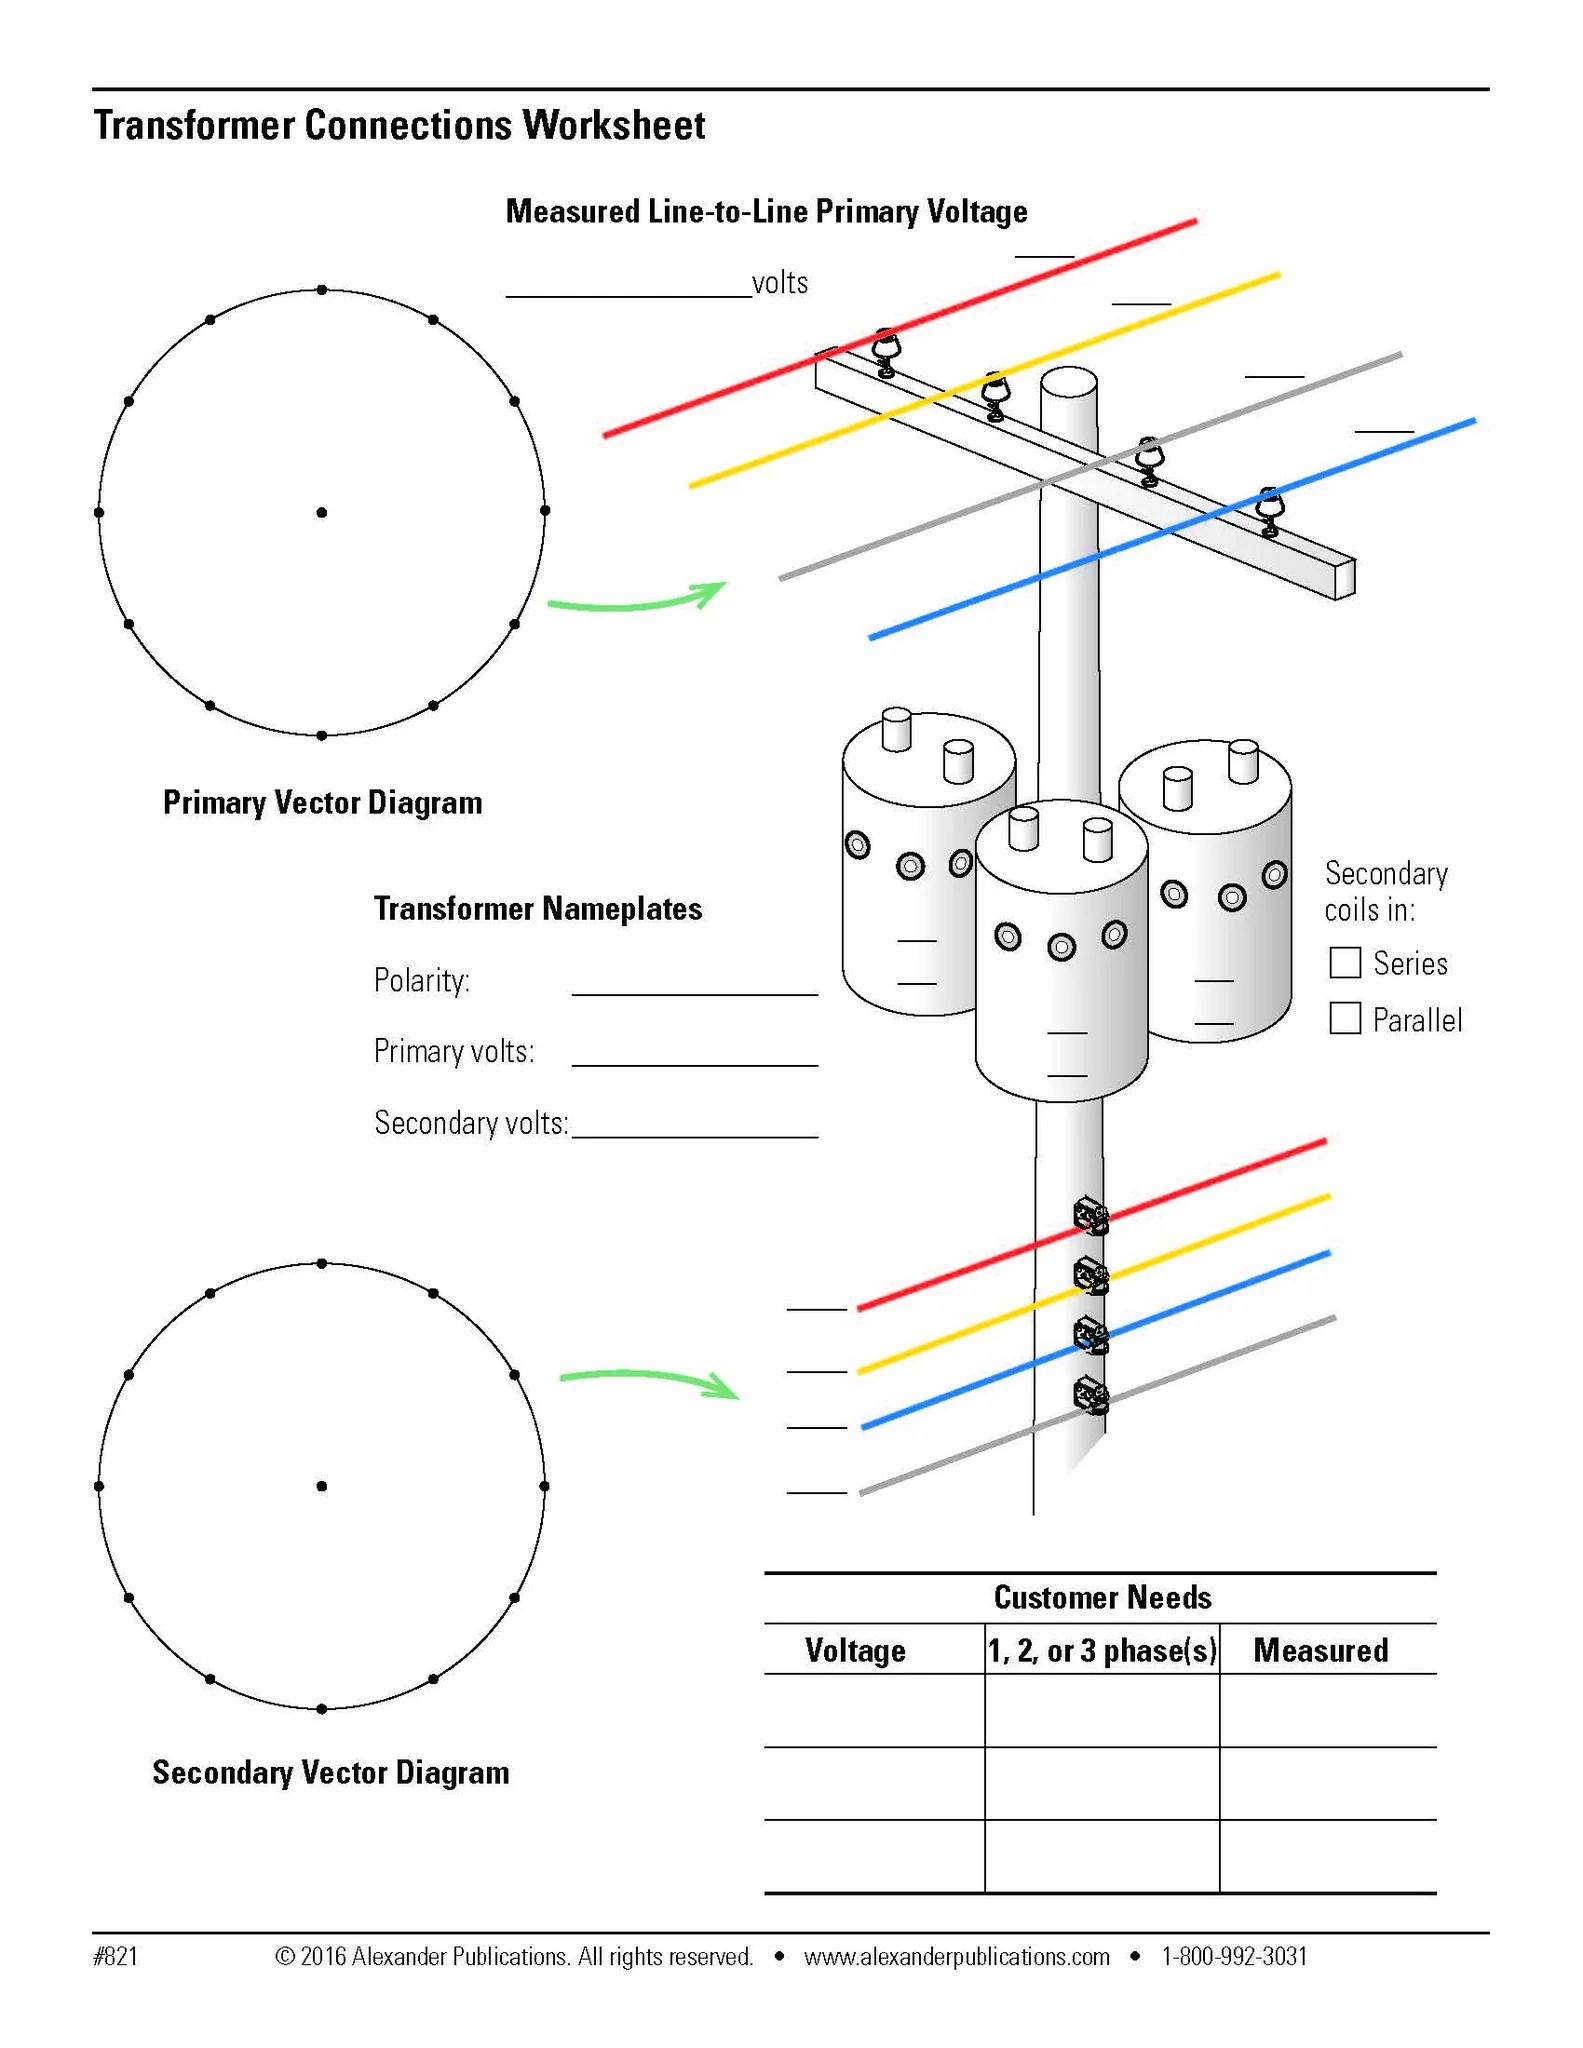 3 phase multi tap transformer connection diagram wiring wiringwiring and transformer connection diagram 2 10 depo [ 1583 x 2048 Pixel ]